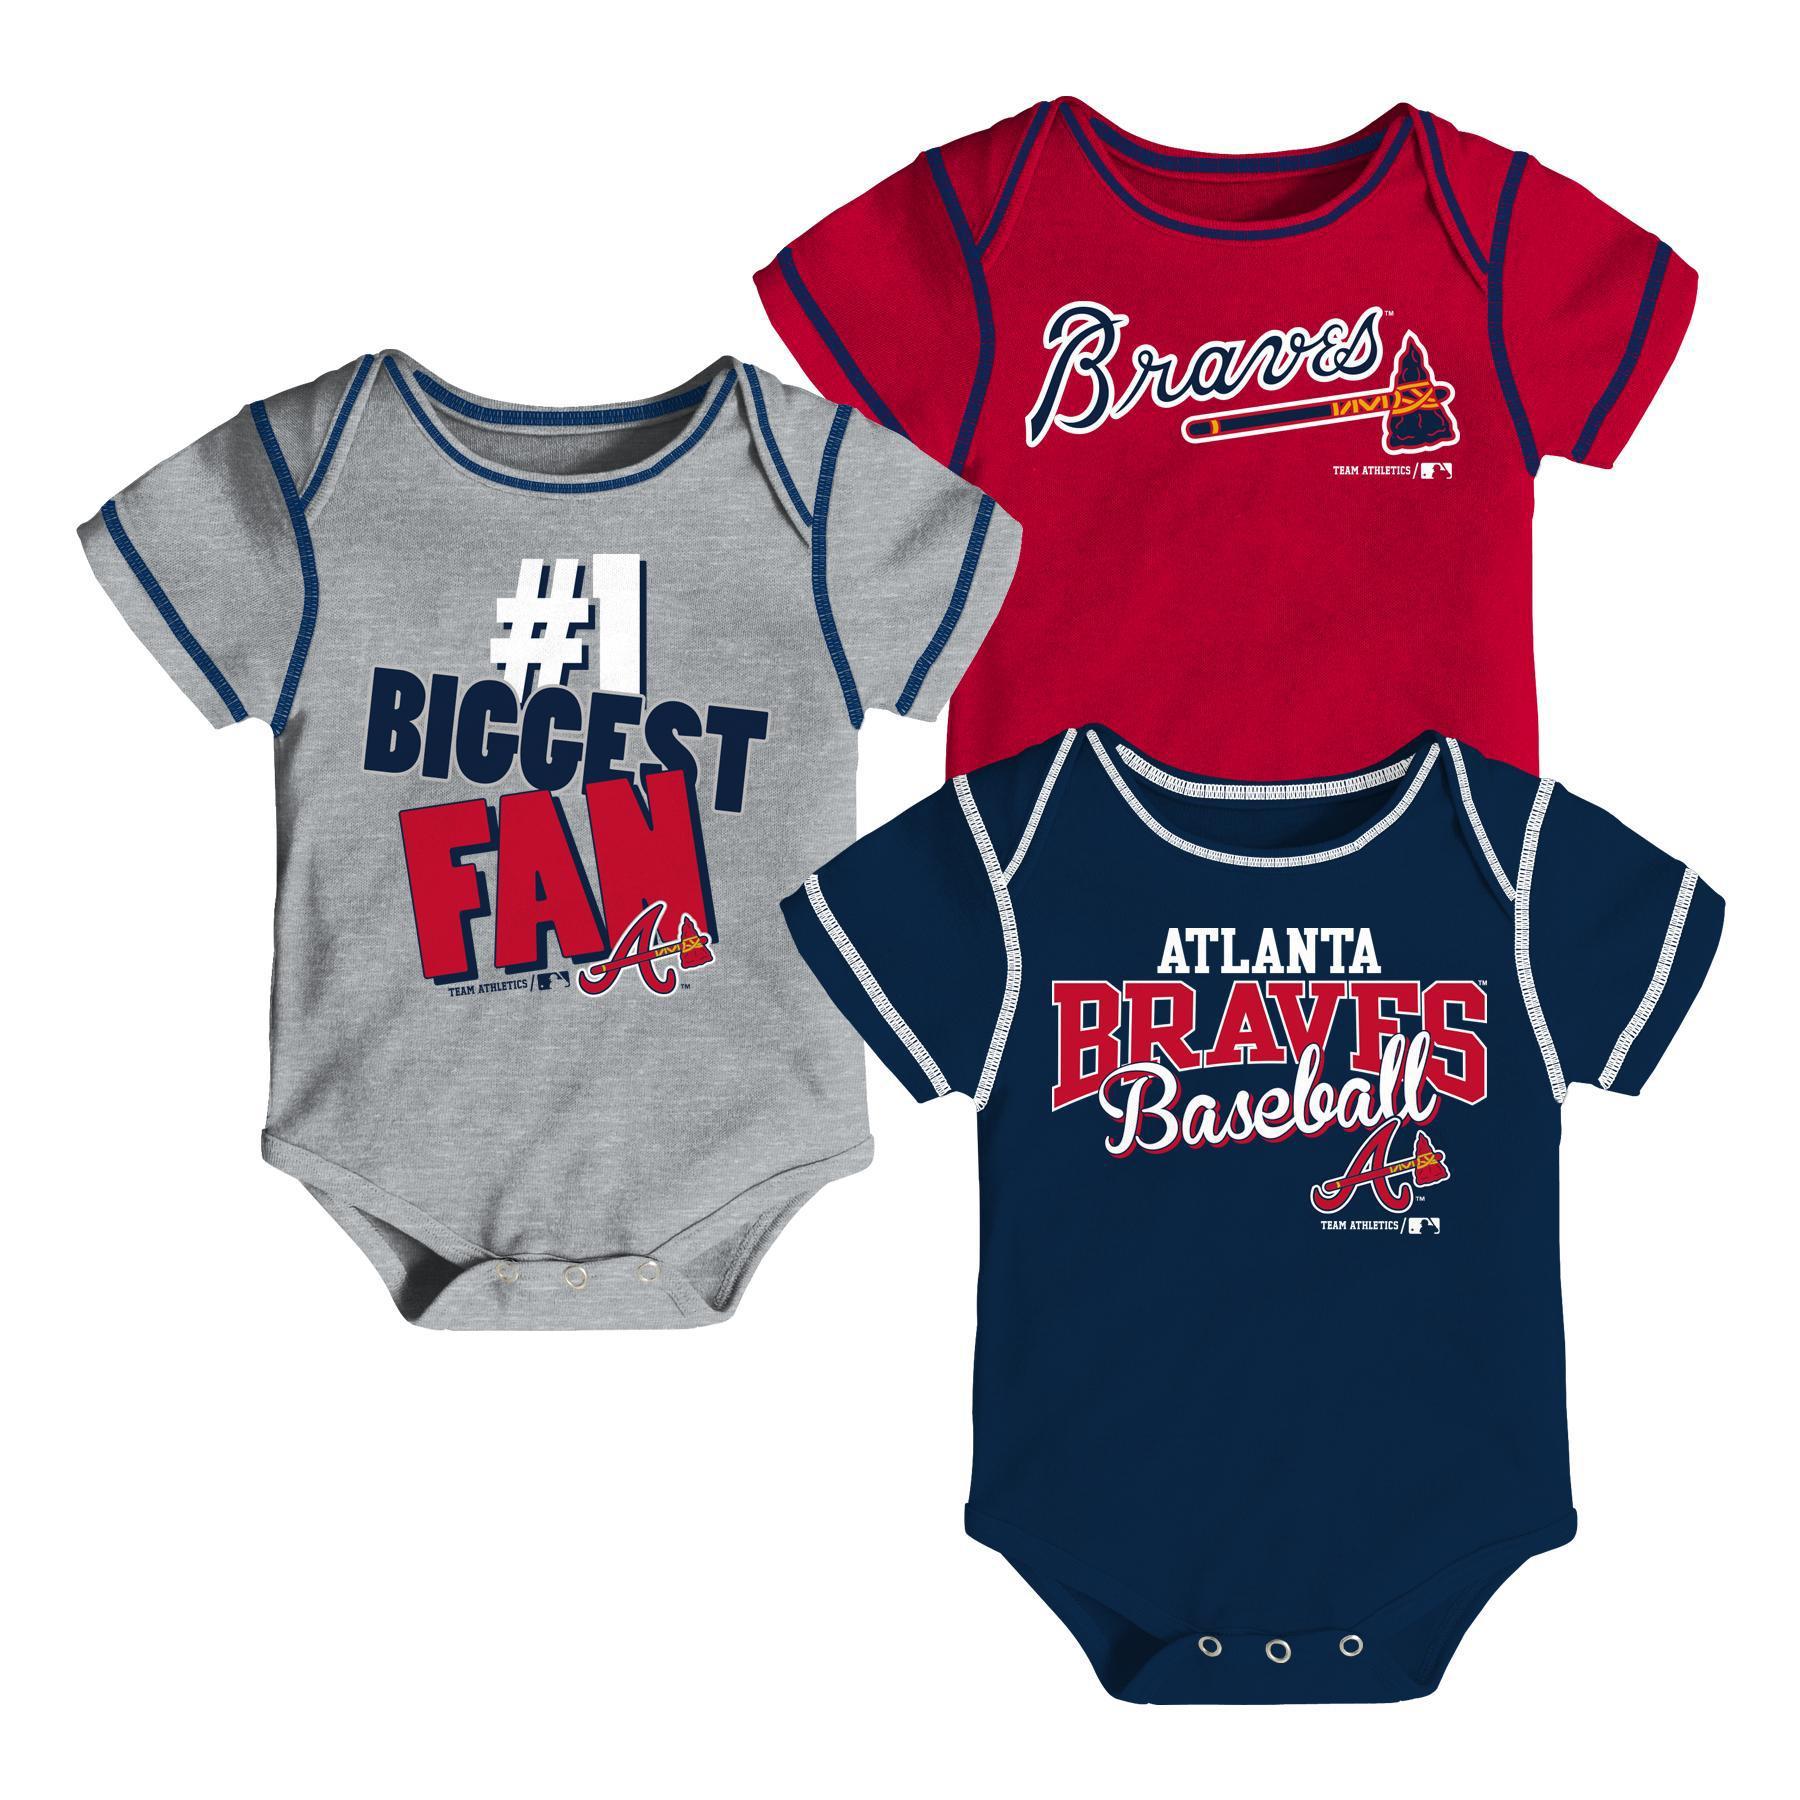 MLB Newborn & Infant Boys' 3-Pack Bodysuits - Atlanta Braves, Size: 18 Months im test